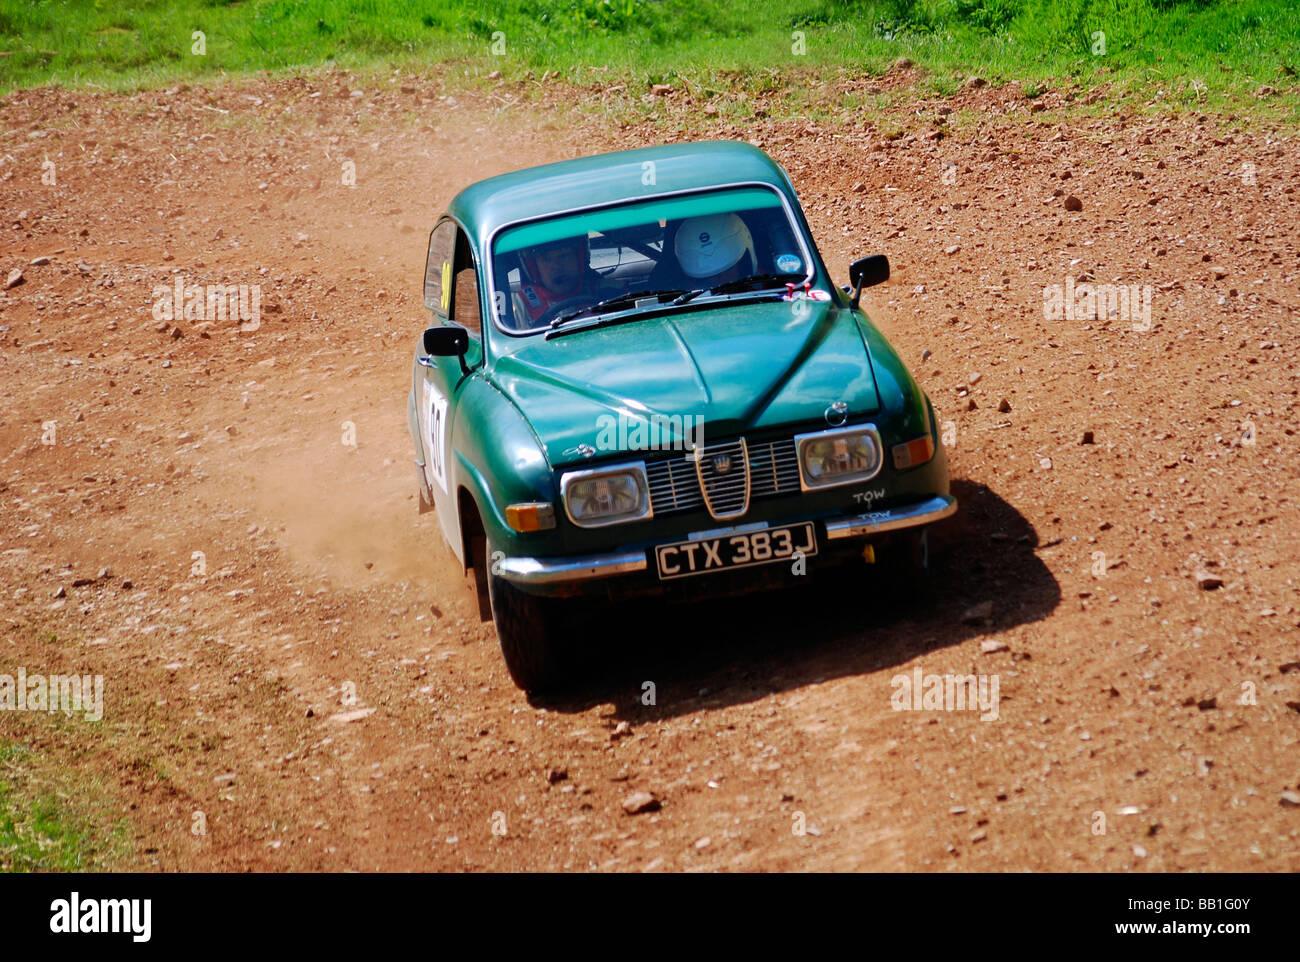 Saab V4 Rally Car - Stock Image